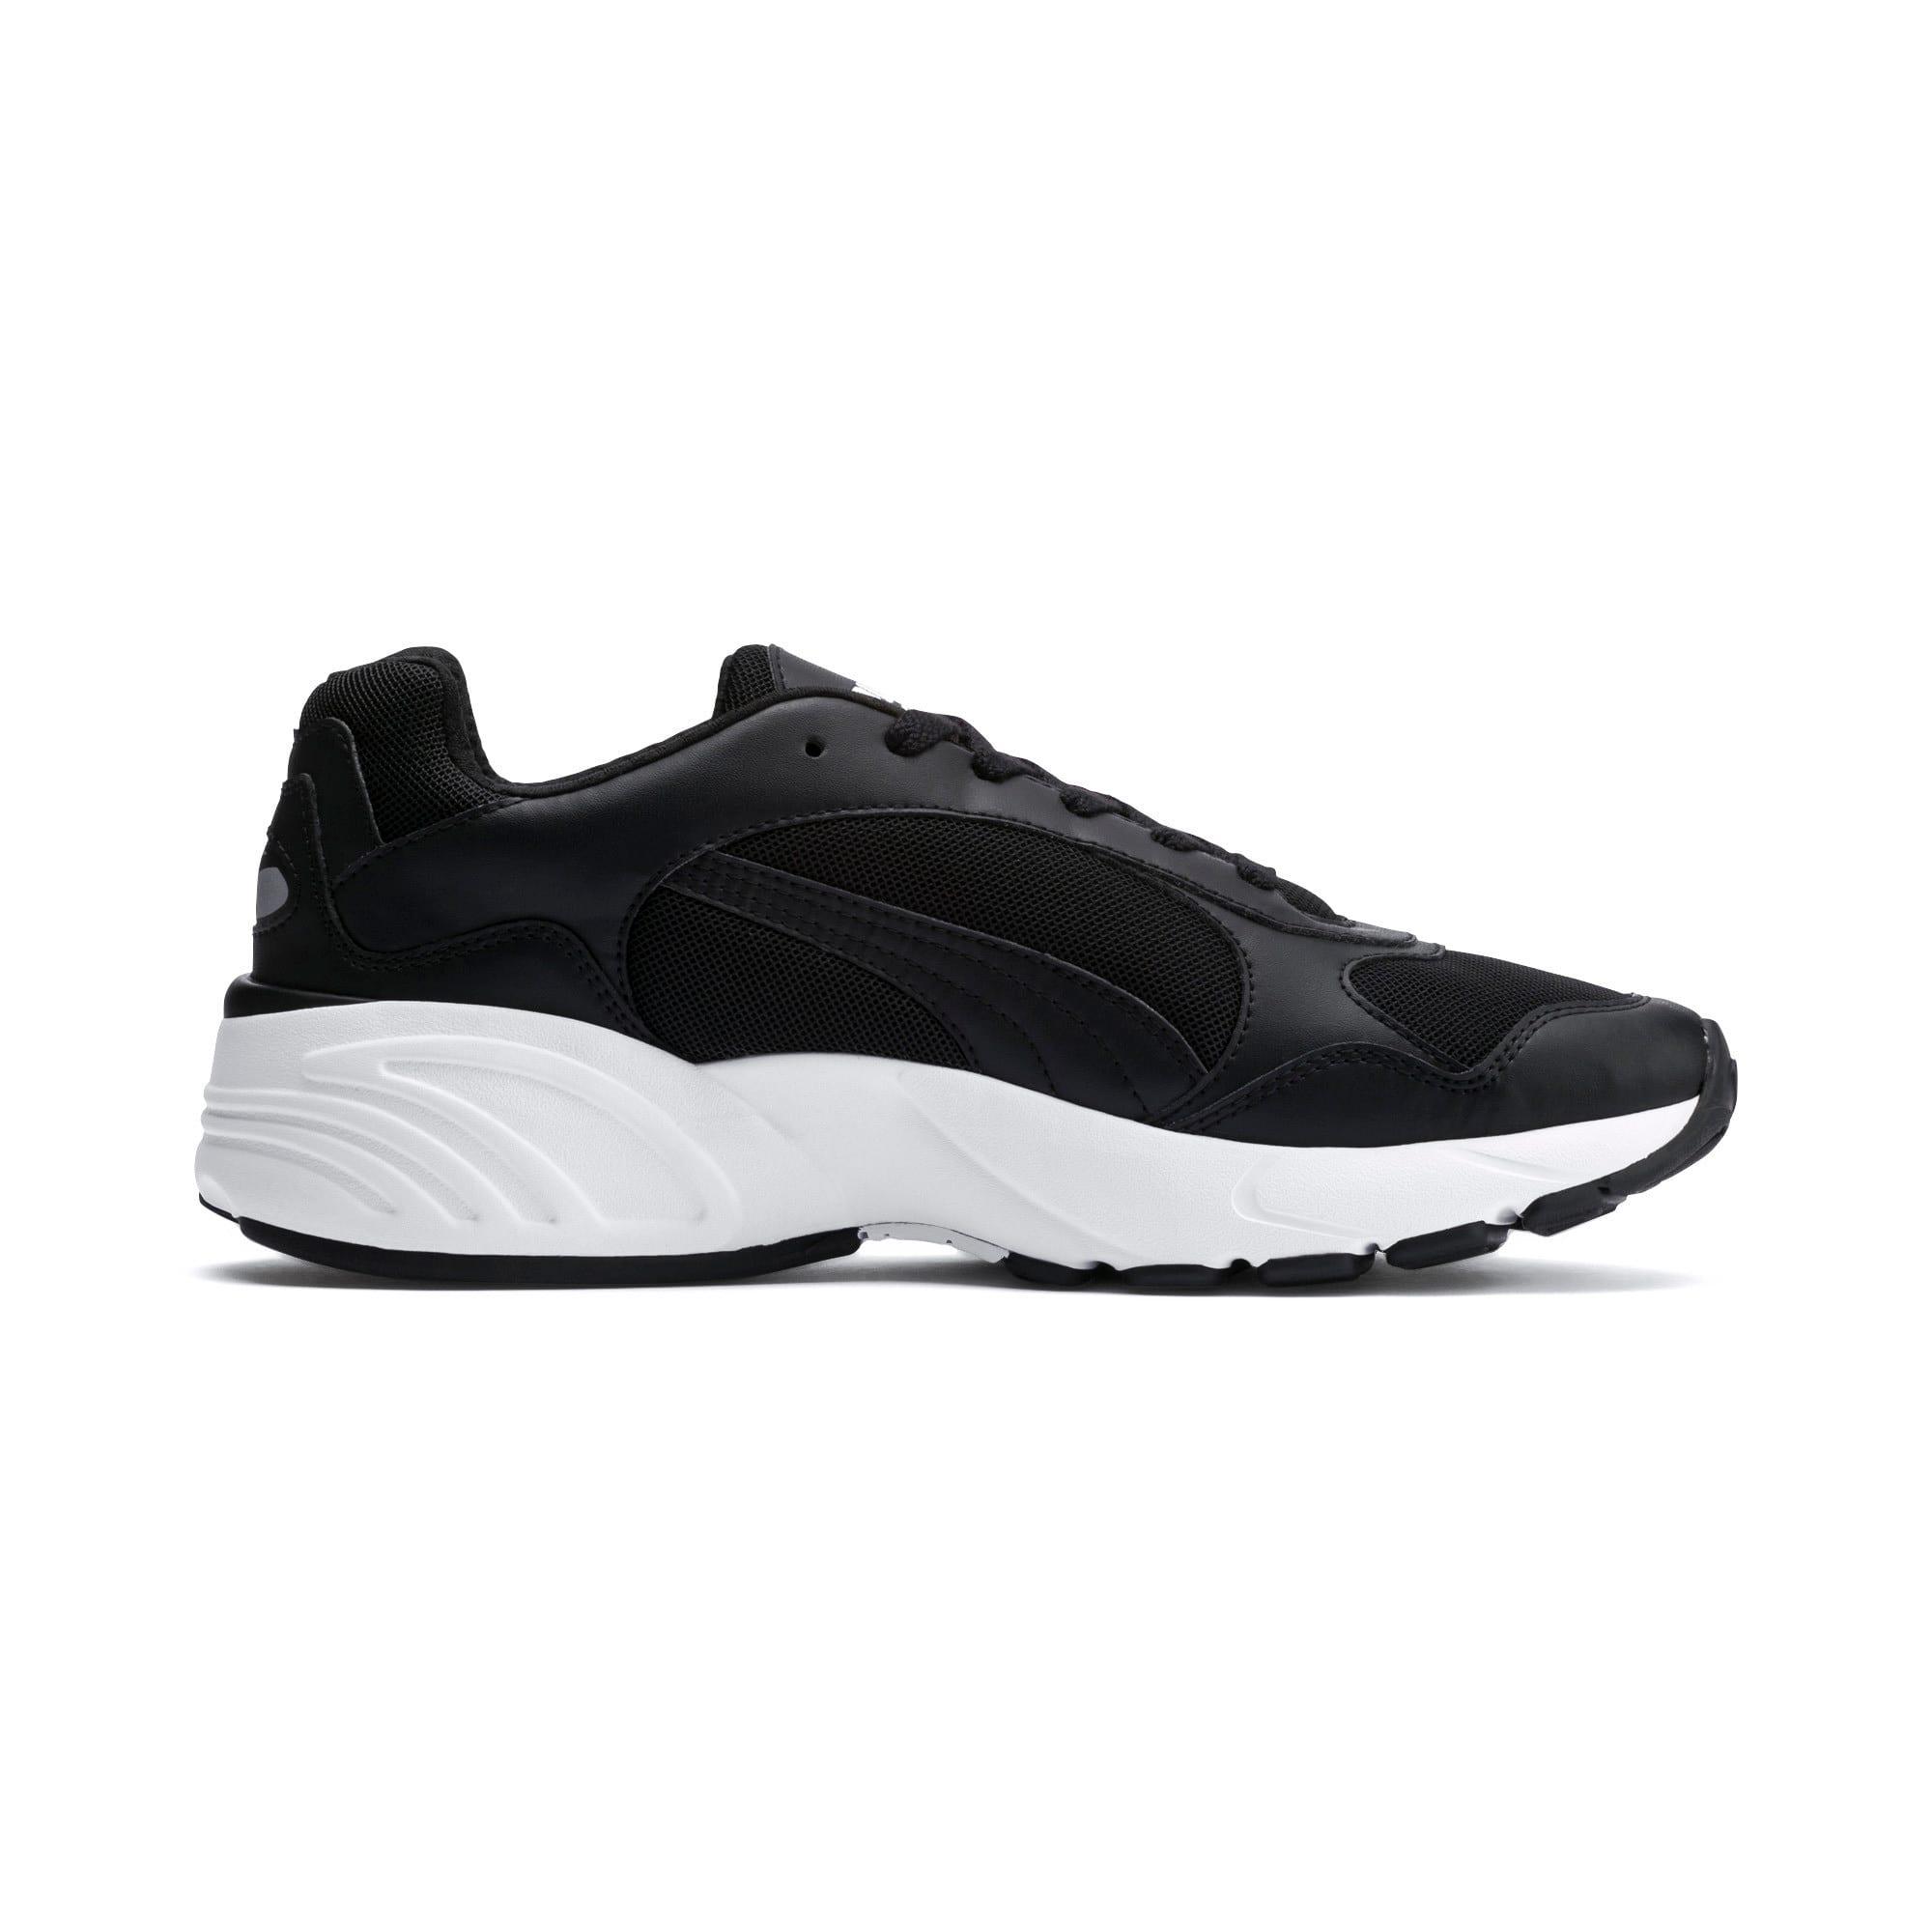 Thumbnail 5 of CELL Viper Sneakers, Puma Black-Puma White, medium